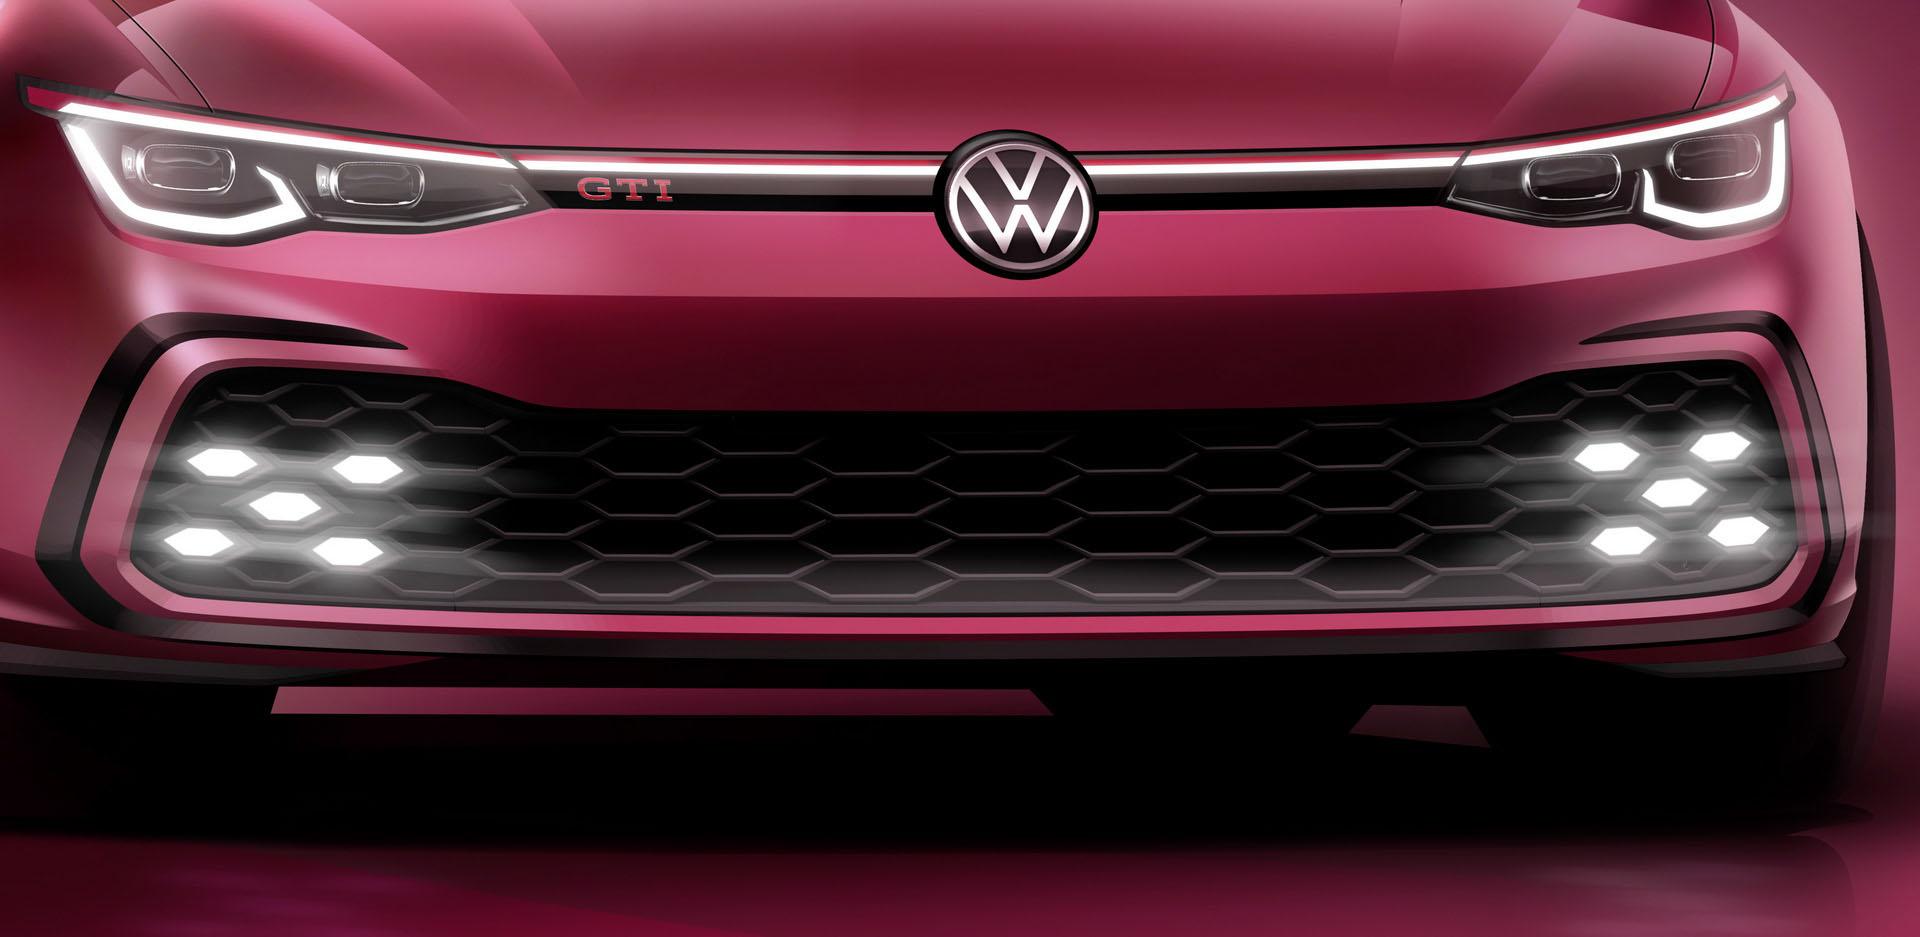 Volkswagen Golf GTI 2020